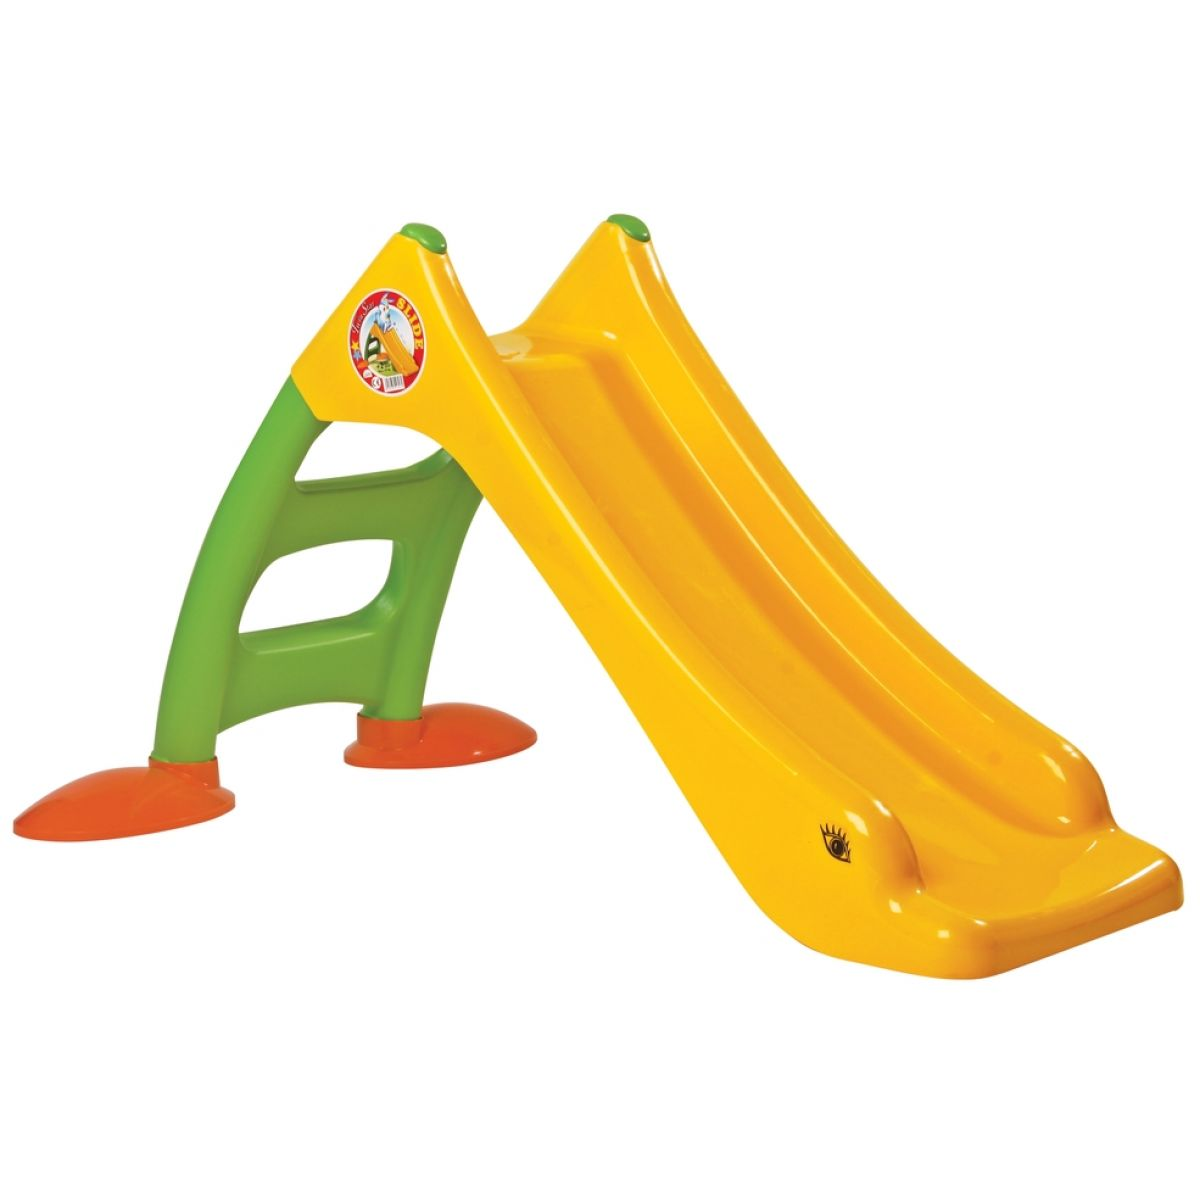 Skluzavka 130 cm - Žlutá